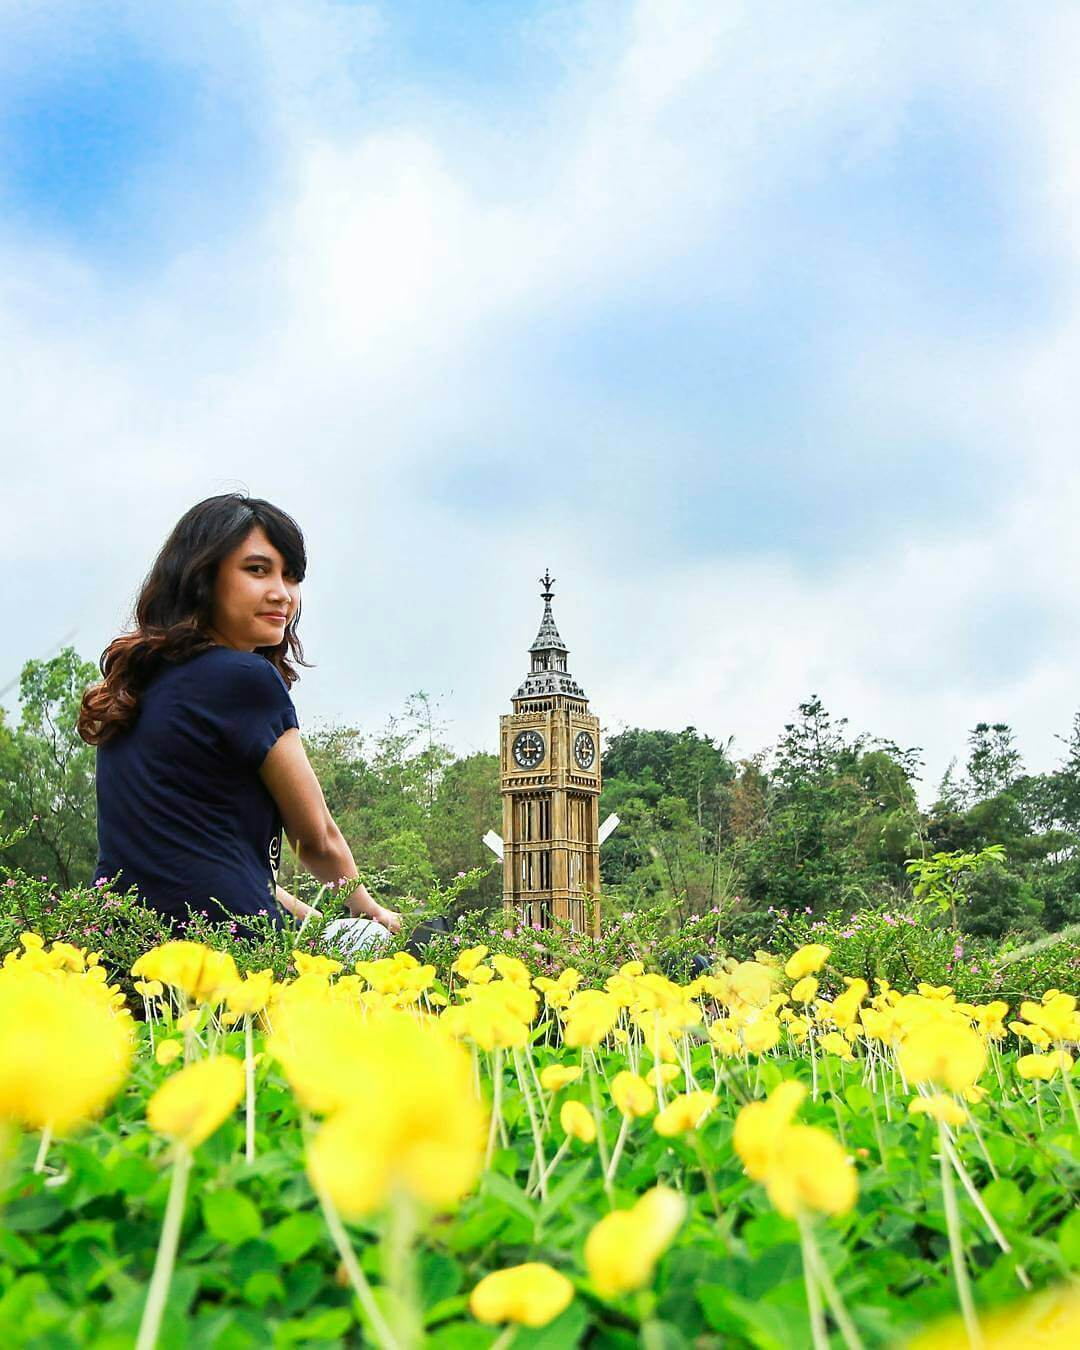 Destinasi Wisata Bernuansa Kumpulan Landmark Dunia di Indonesia